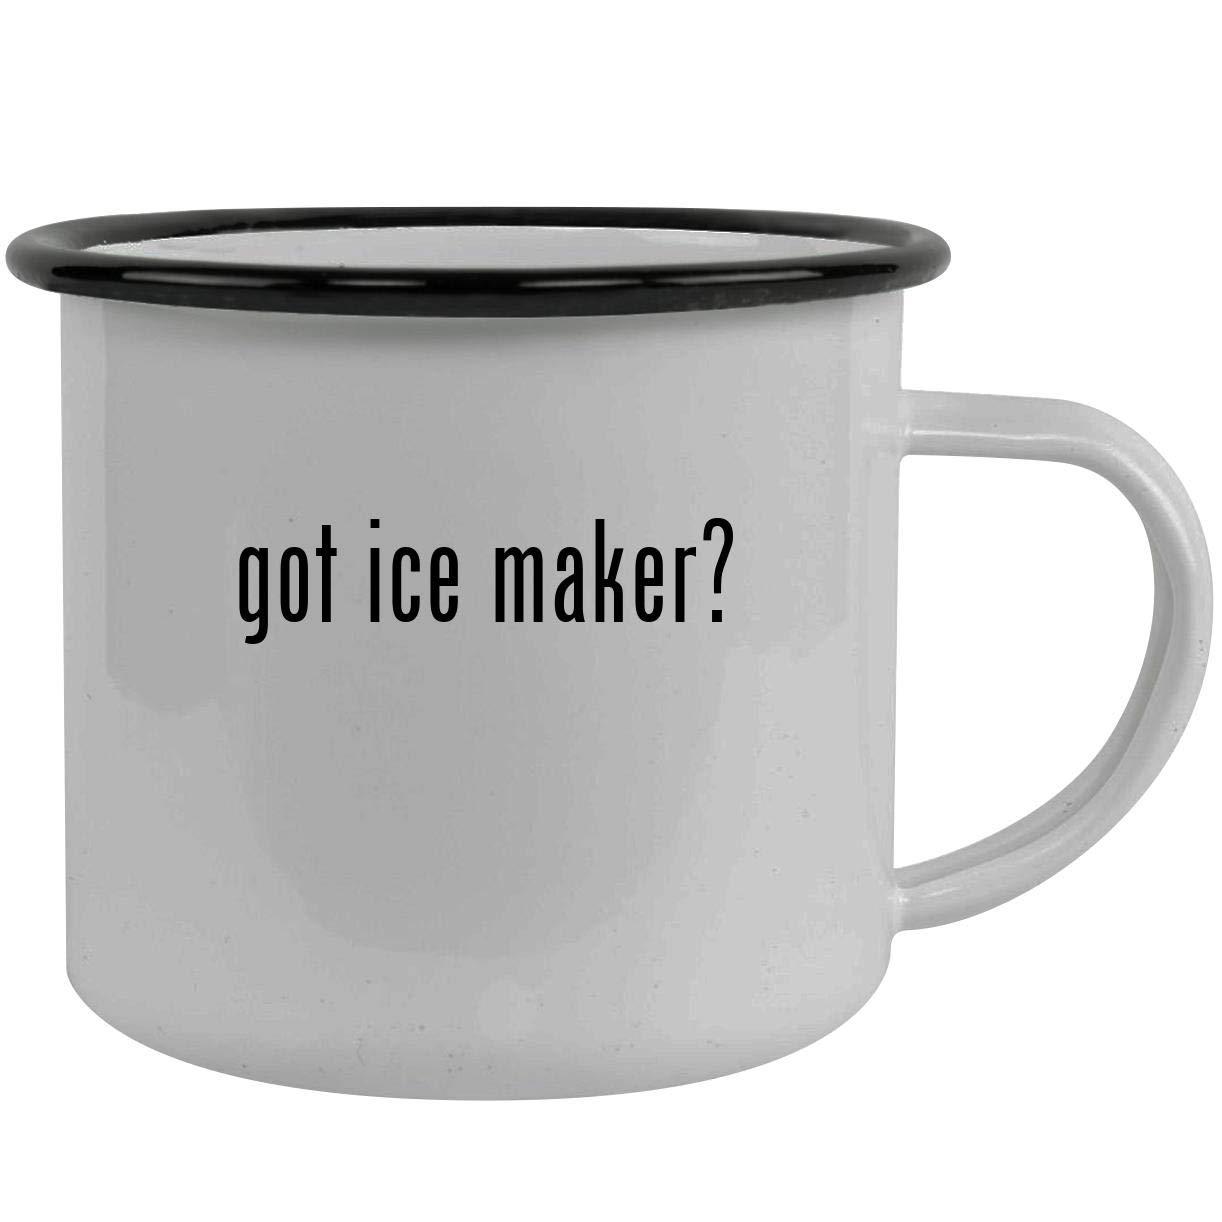 got ice maker? - Stainless Steel 12oz Camping Mug, Black